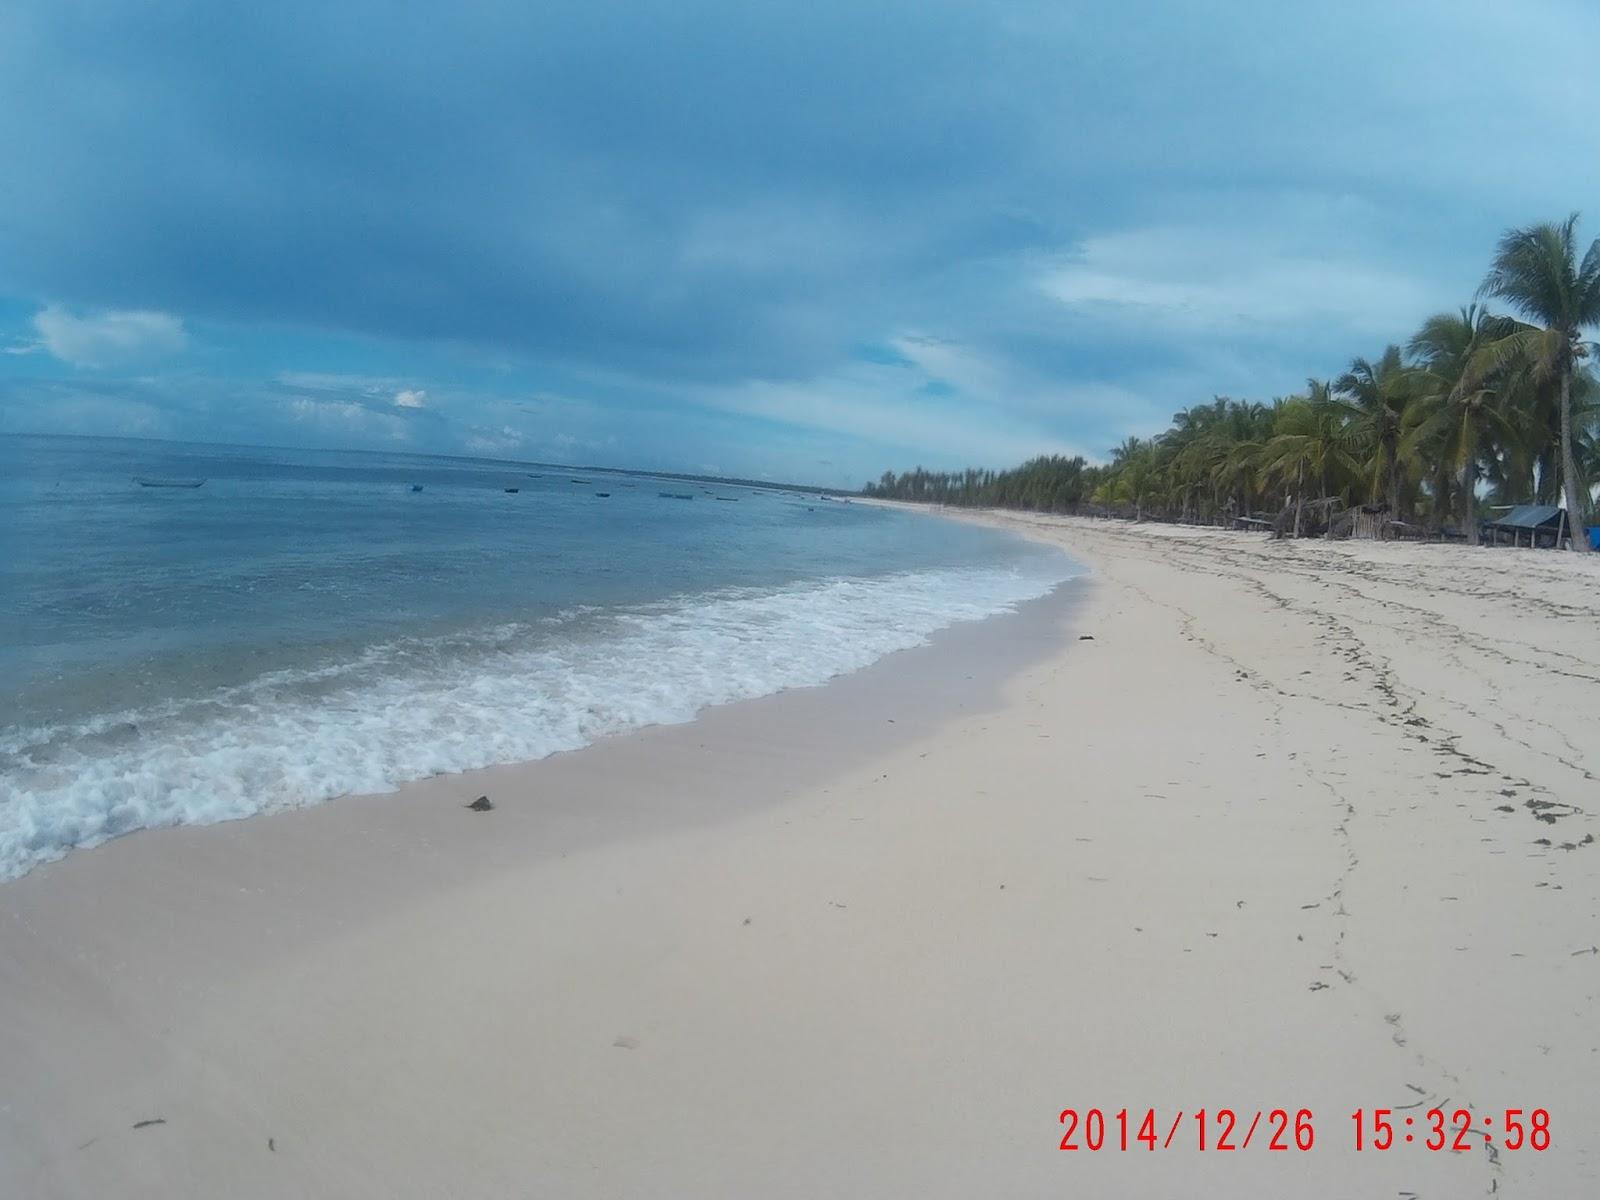 Rote Kabupaten Selatan Indonesia Dum Vita Est Spest Pantai Nemberala